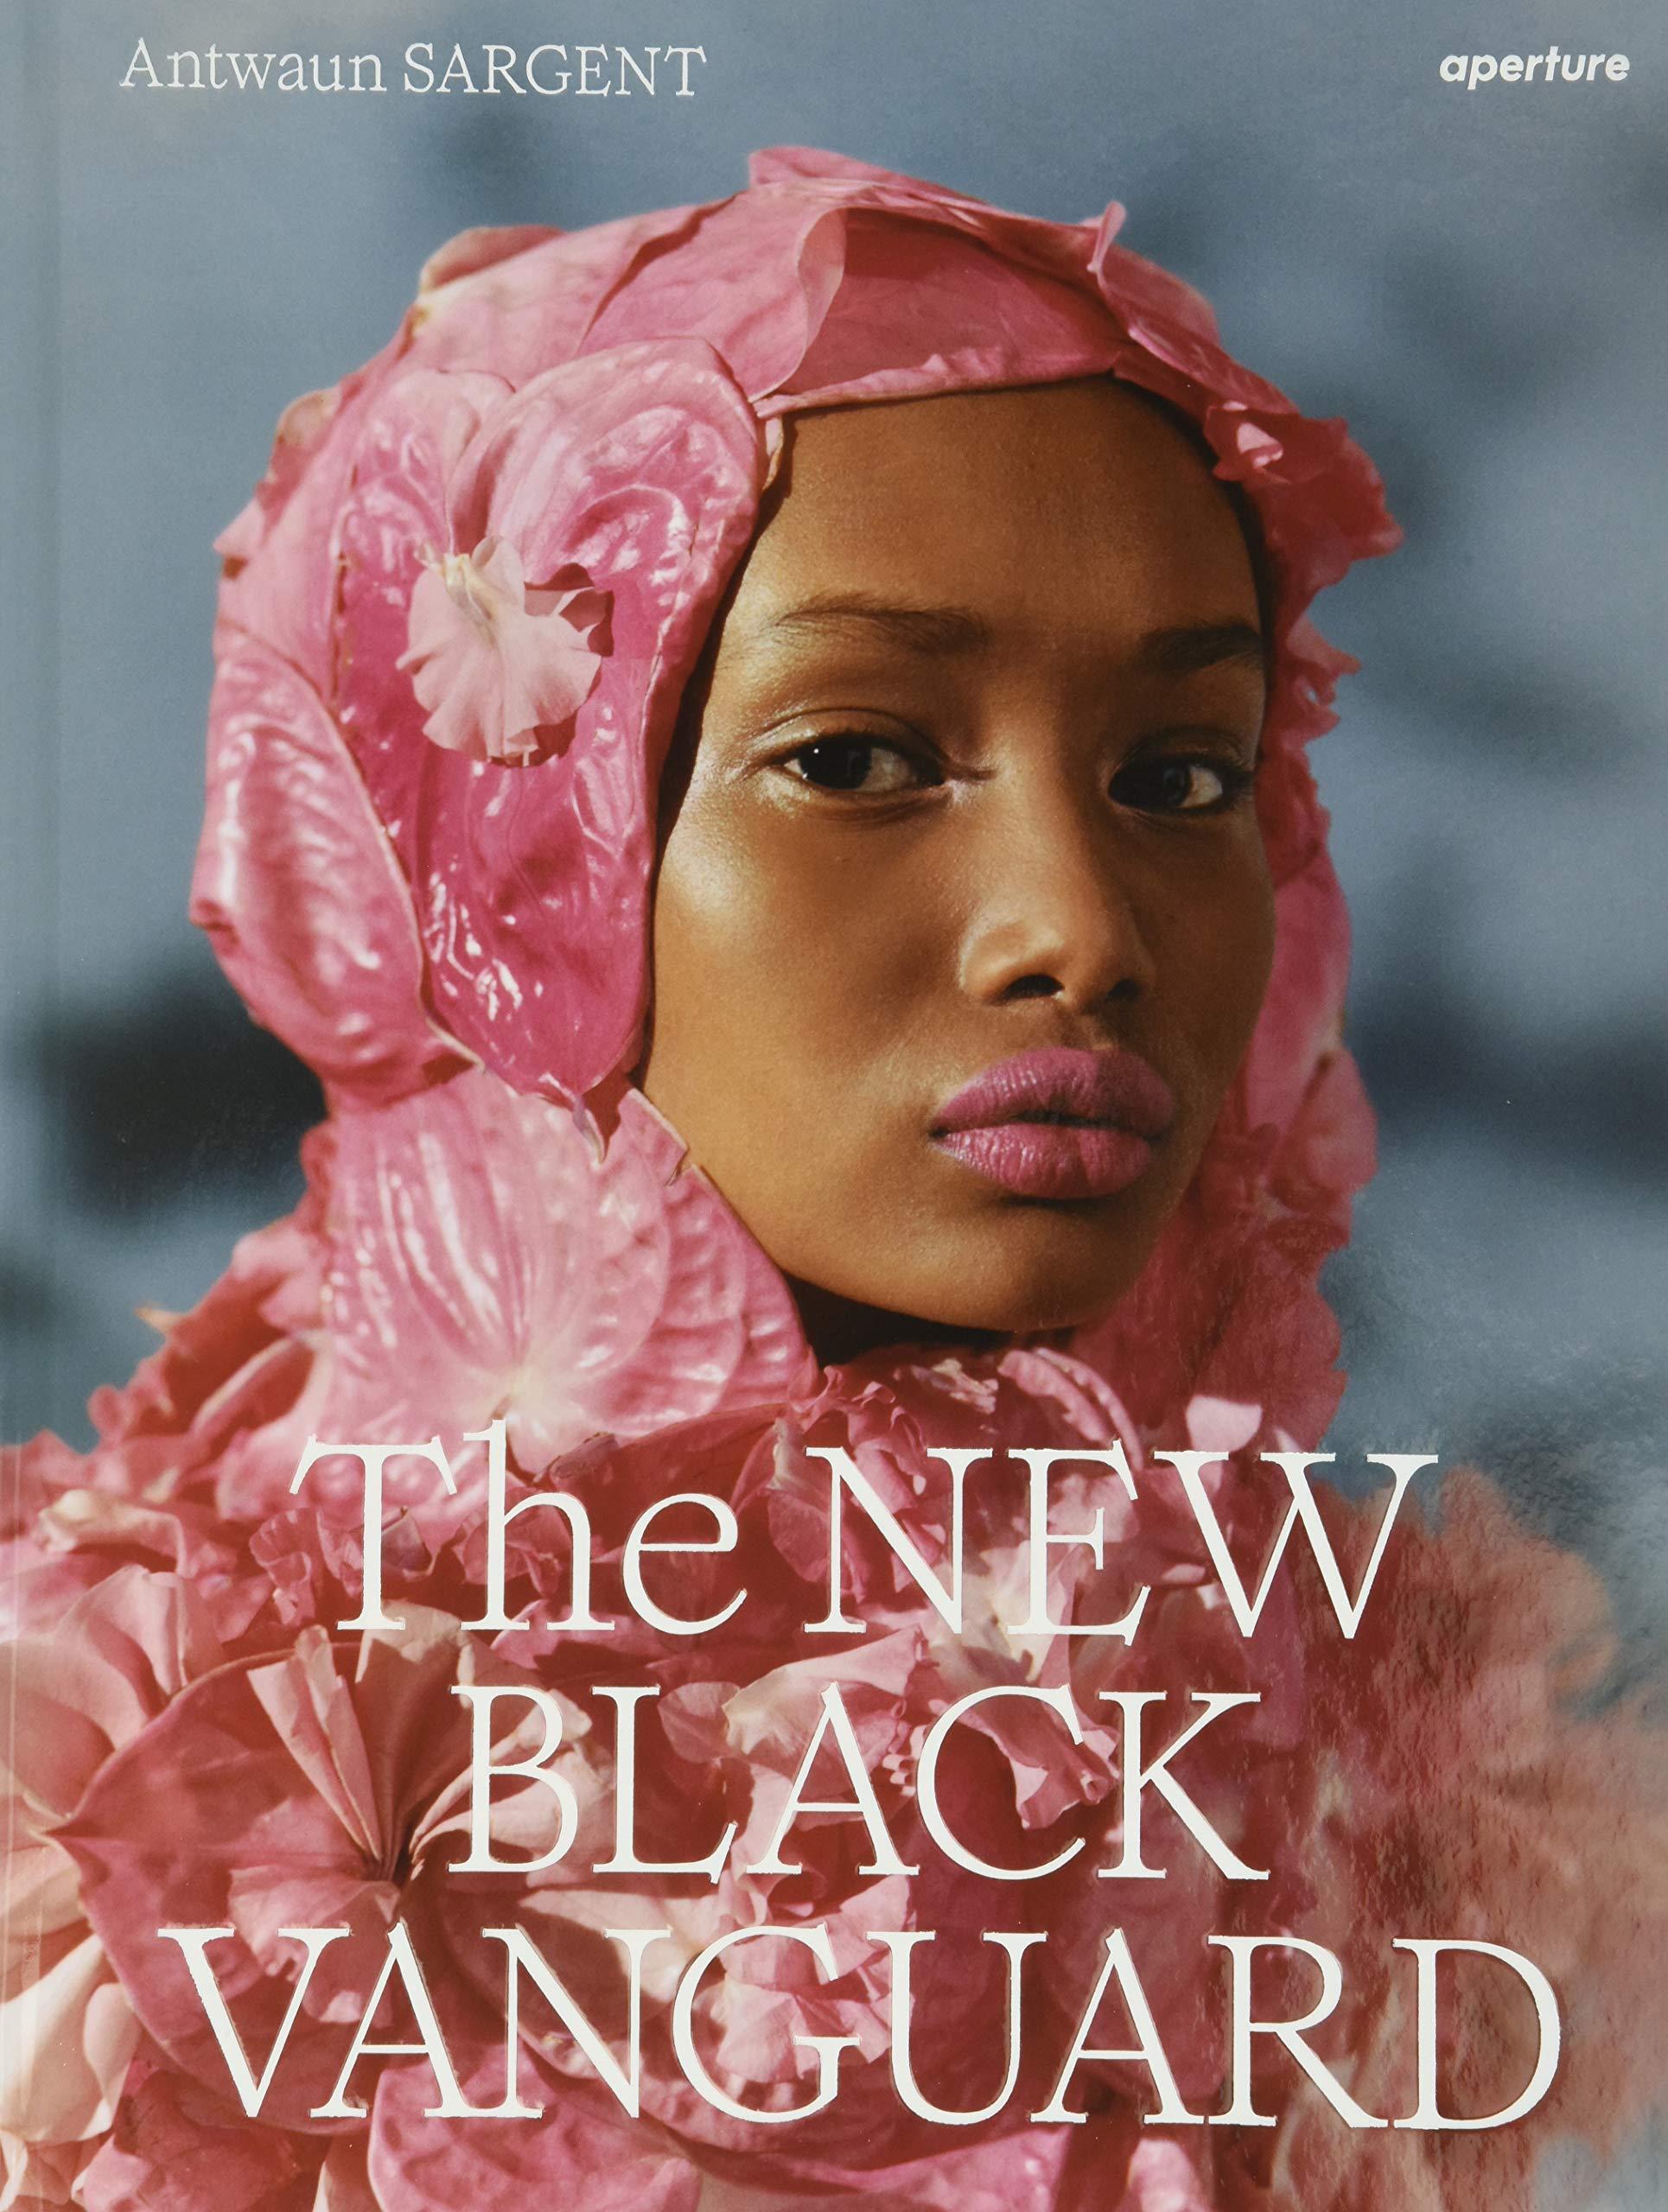 The New Black Vanguard: Photography Between Art and Fashion: Amazon.co.uk:  Sargent, Antwaun, Addy, Campbell, Bobb-Willis, Arielle, Carter, Micaiah,  Erizku, Awol, Ijewere, Nadine, Lemons, Quil, Leuba, Namsa, Medrano, Renell,  Mitchell, Tyler, Nxedlana ...